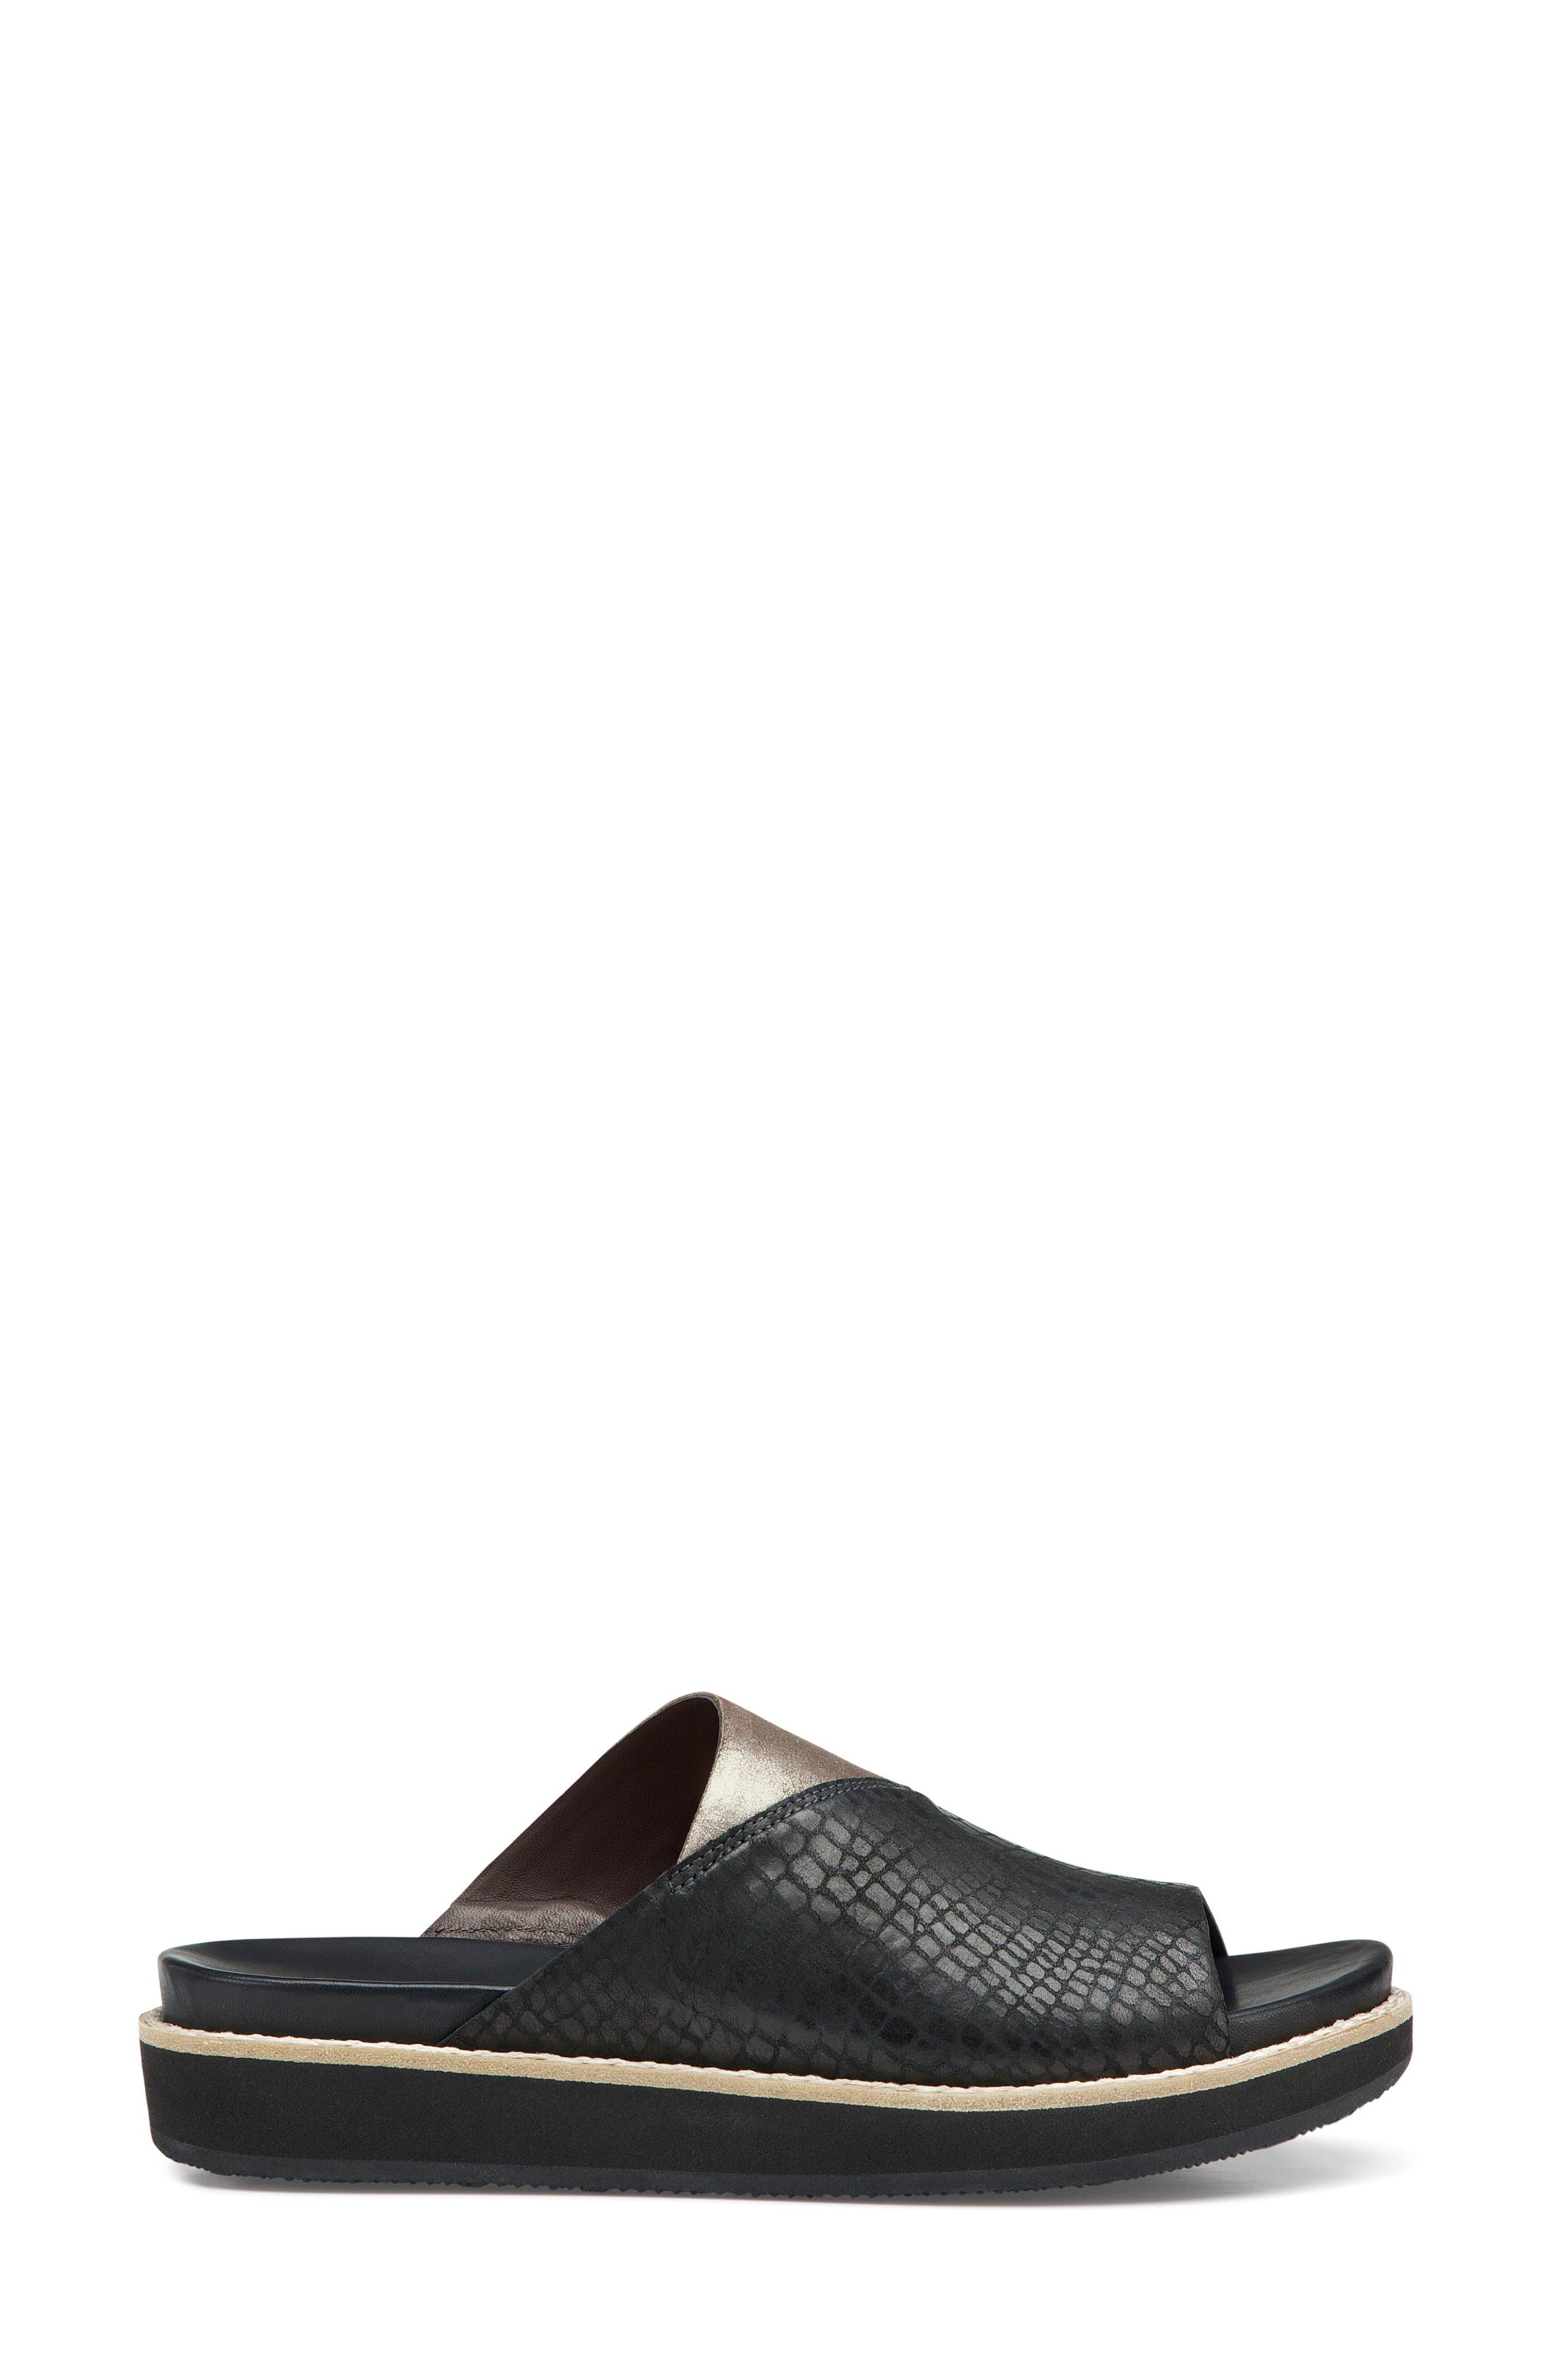 Codi Sandal,                             Alternate thumbnail 3, color,                             Black Embossed Leather